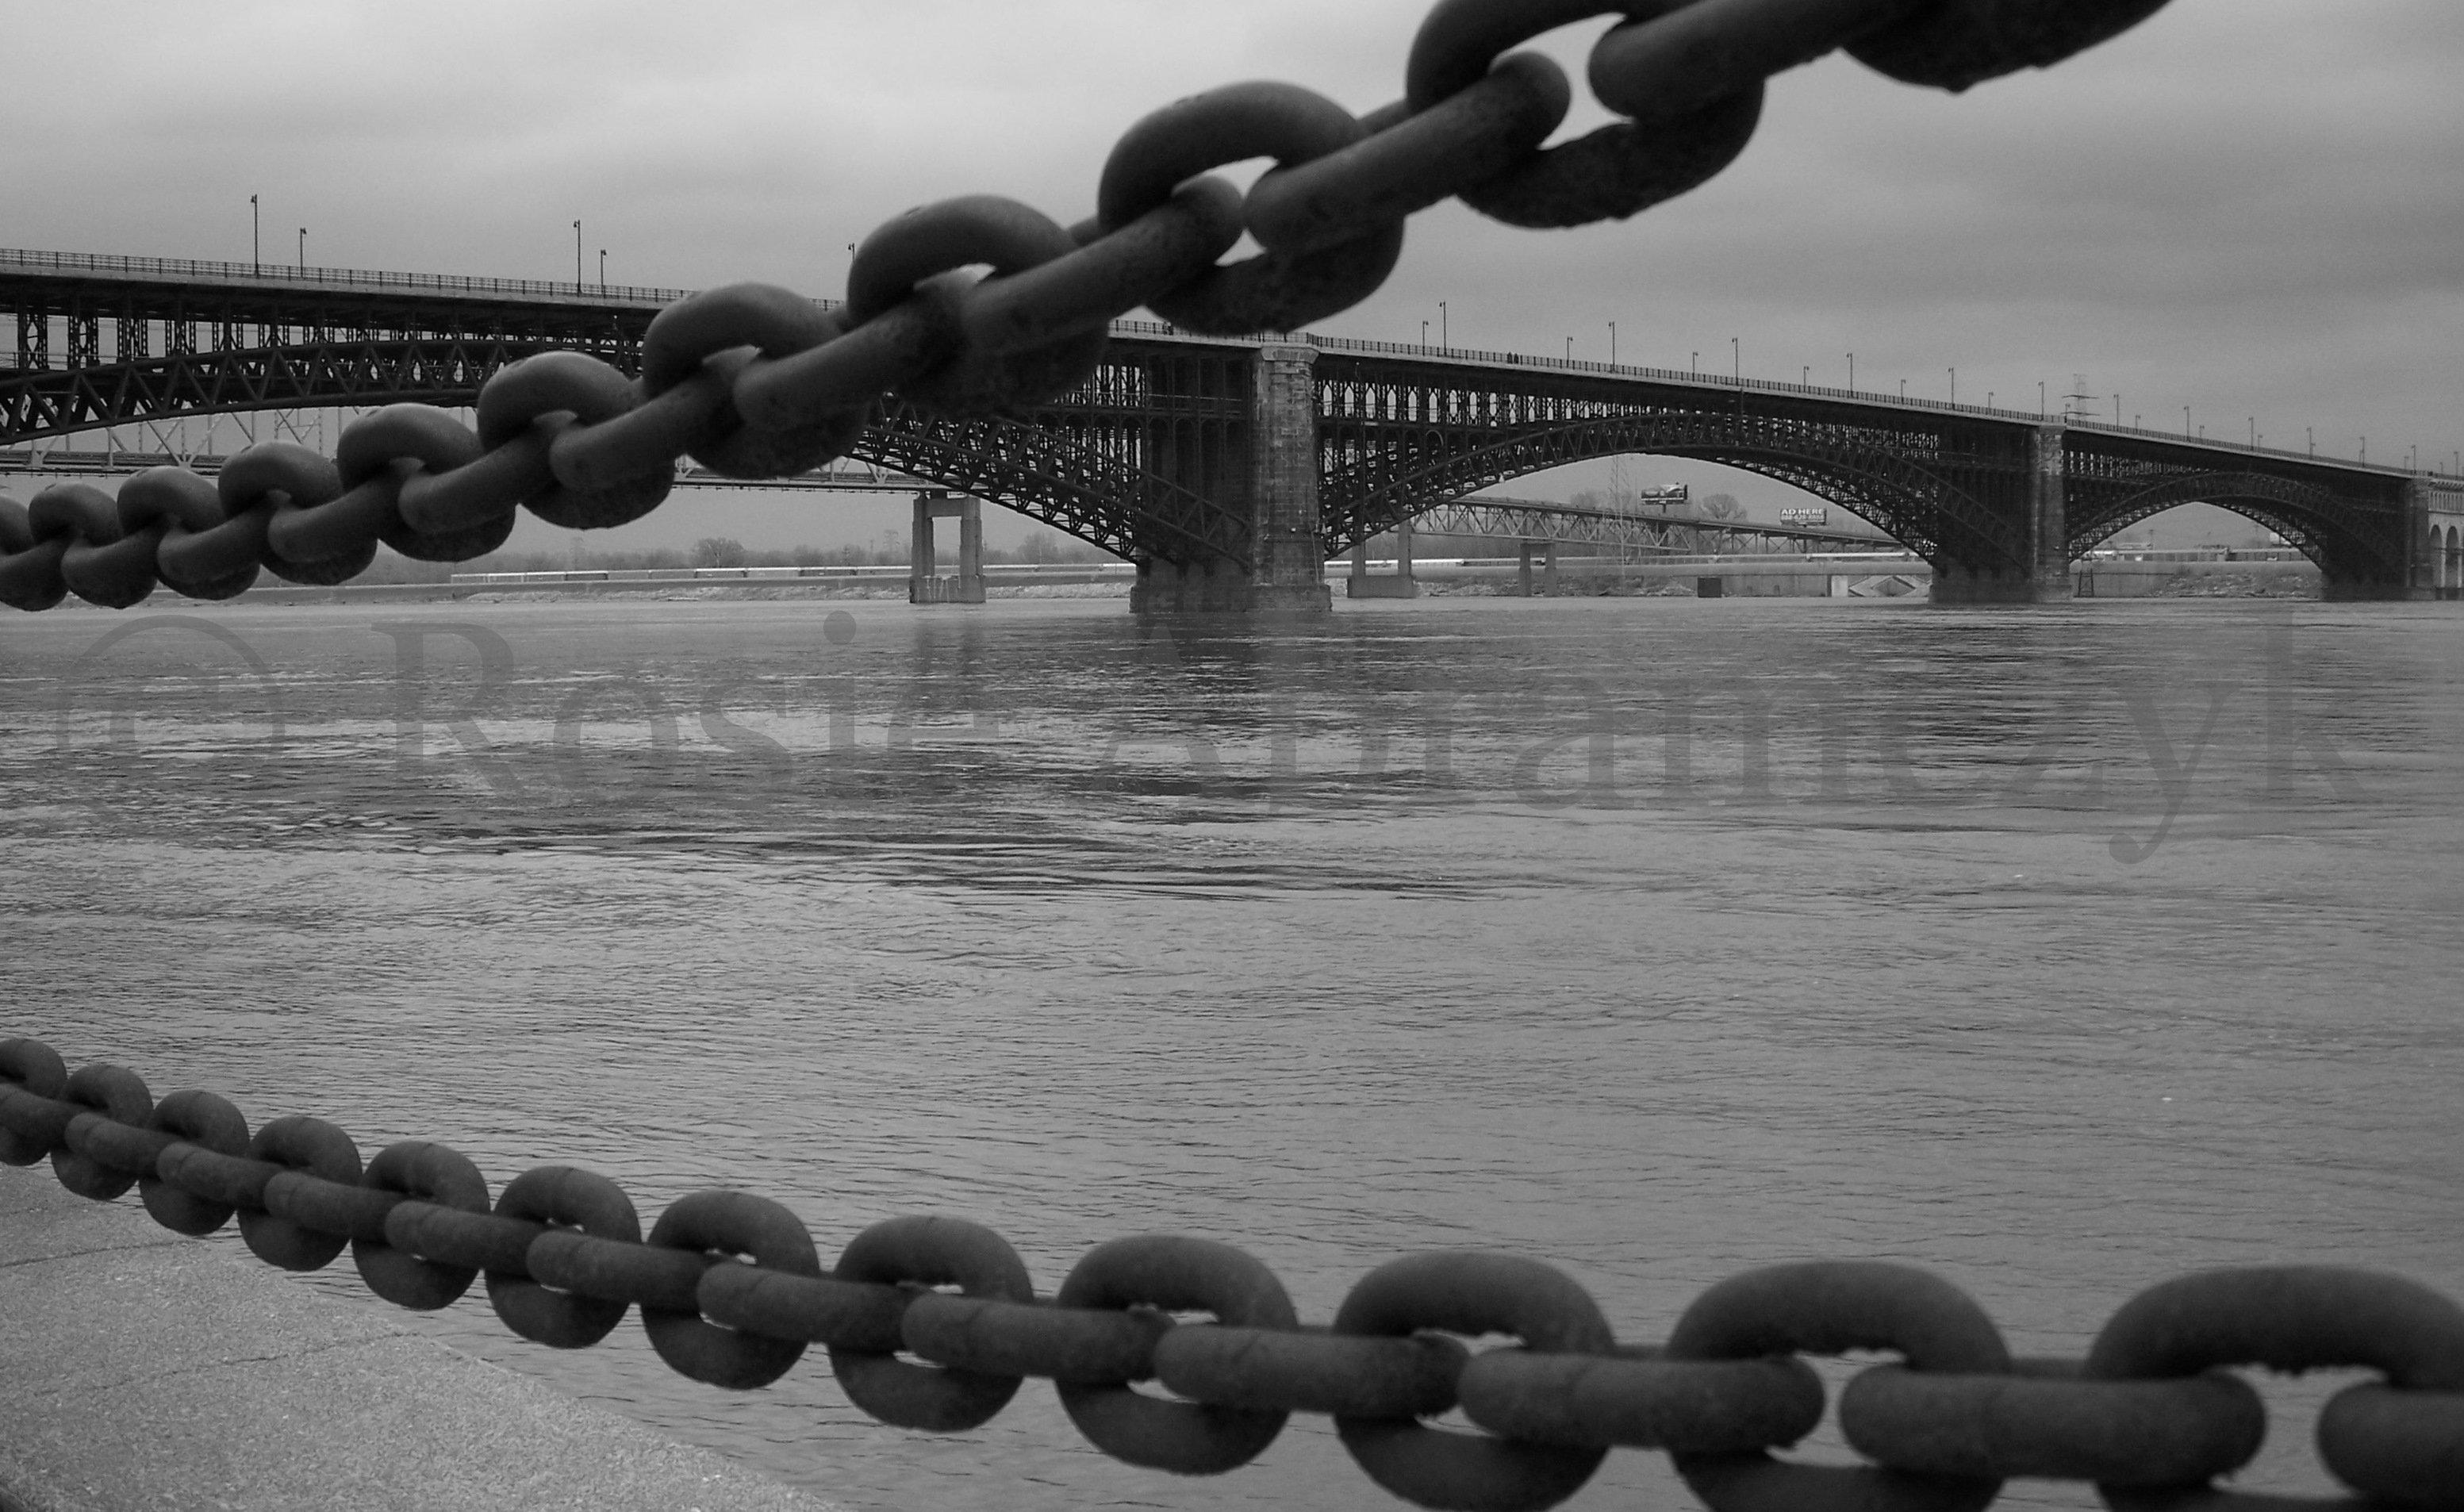 Eads Bridge, St. Louis, MO, By Rosie Abramczyk, Photo, 2008